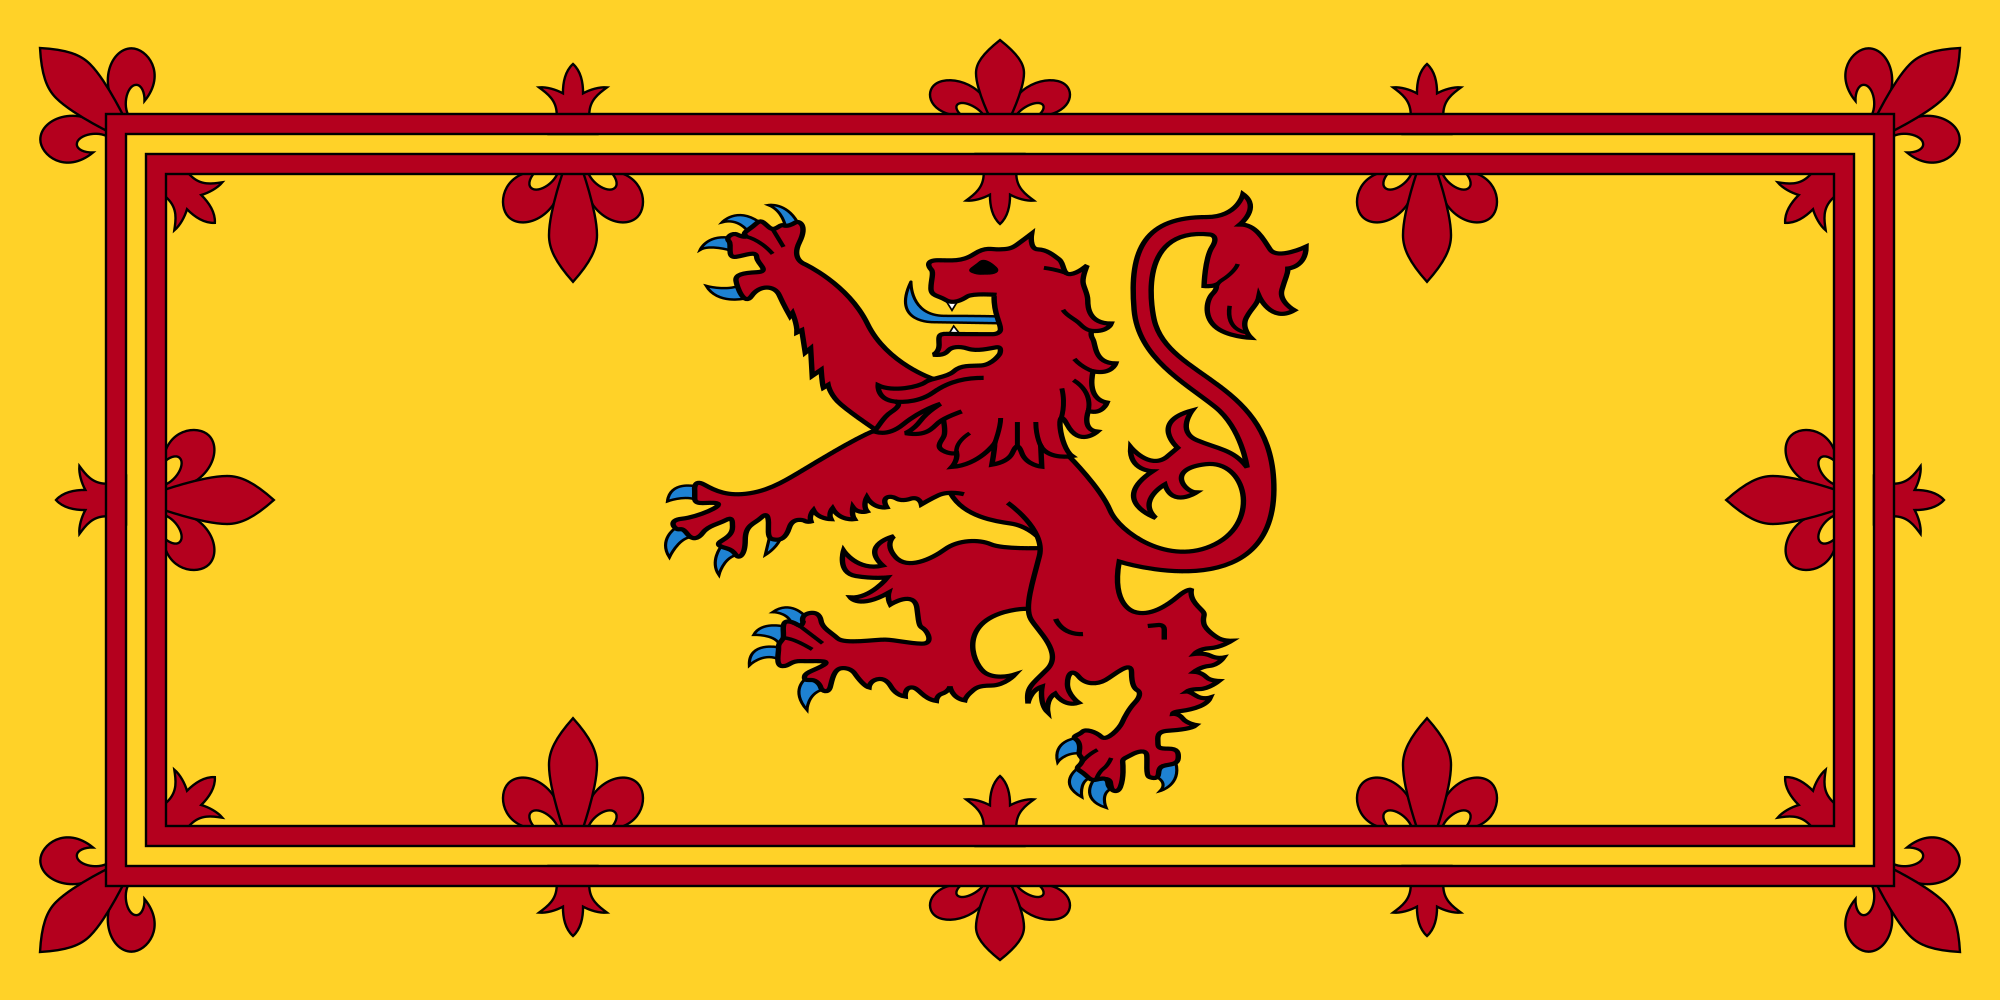 Royal_Banner_of_Scotland_(1-2).svg